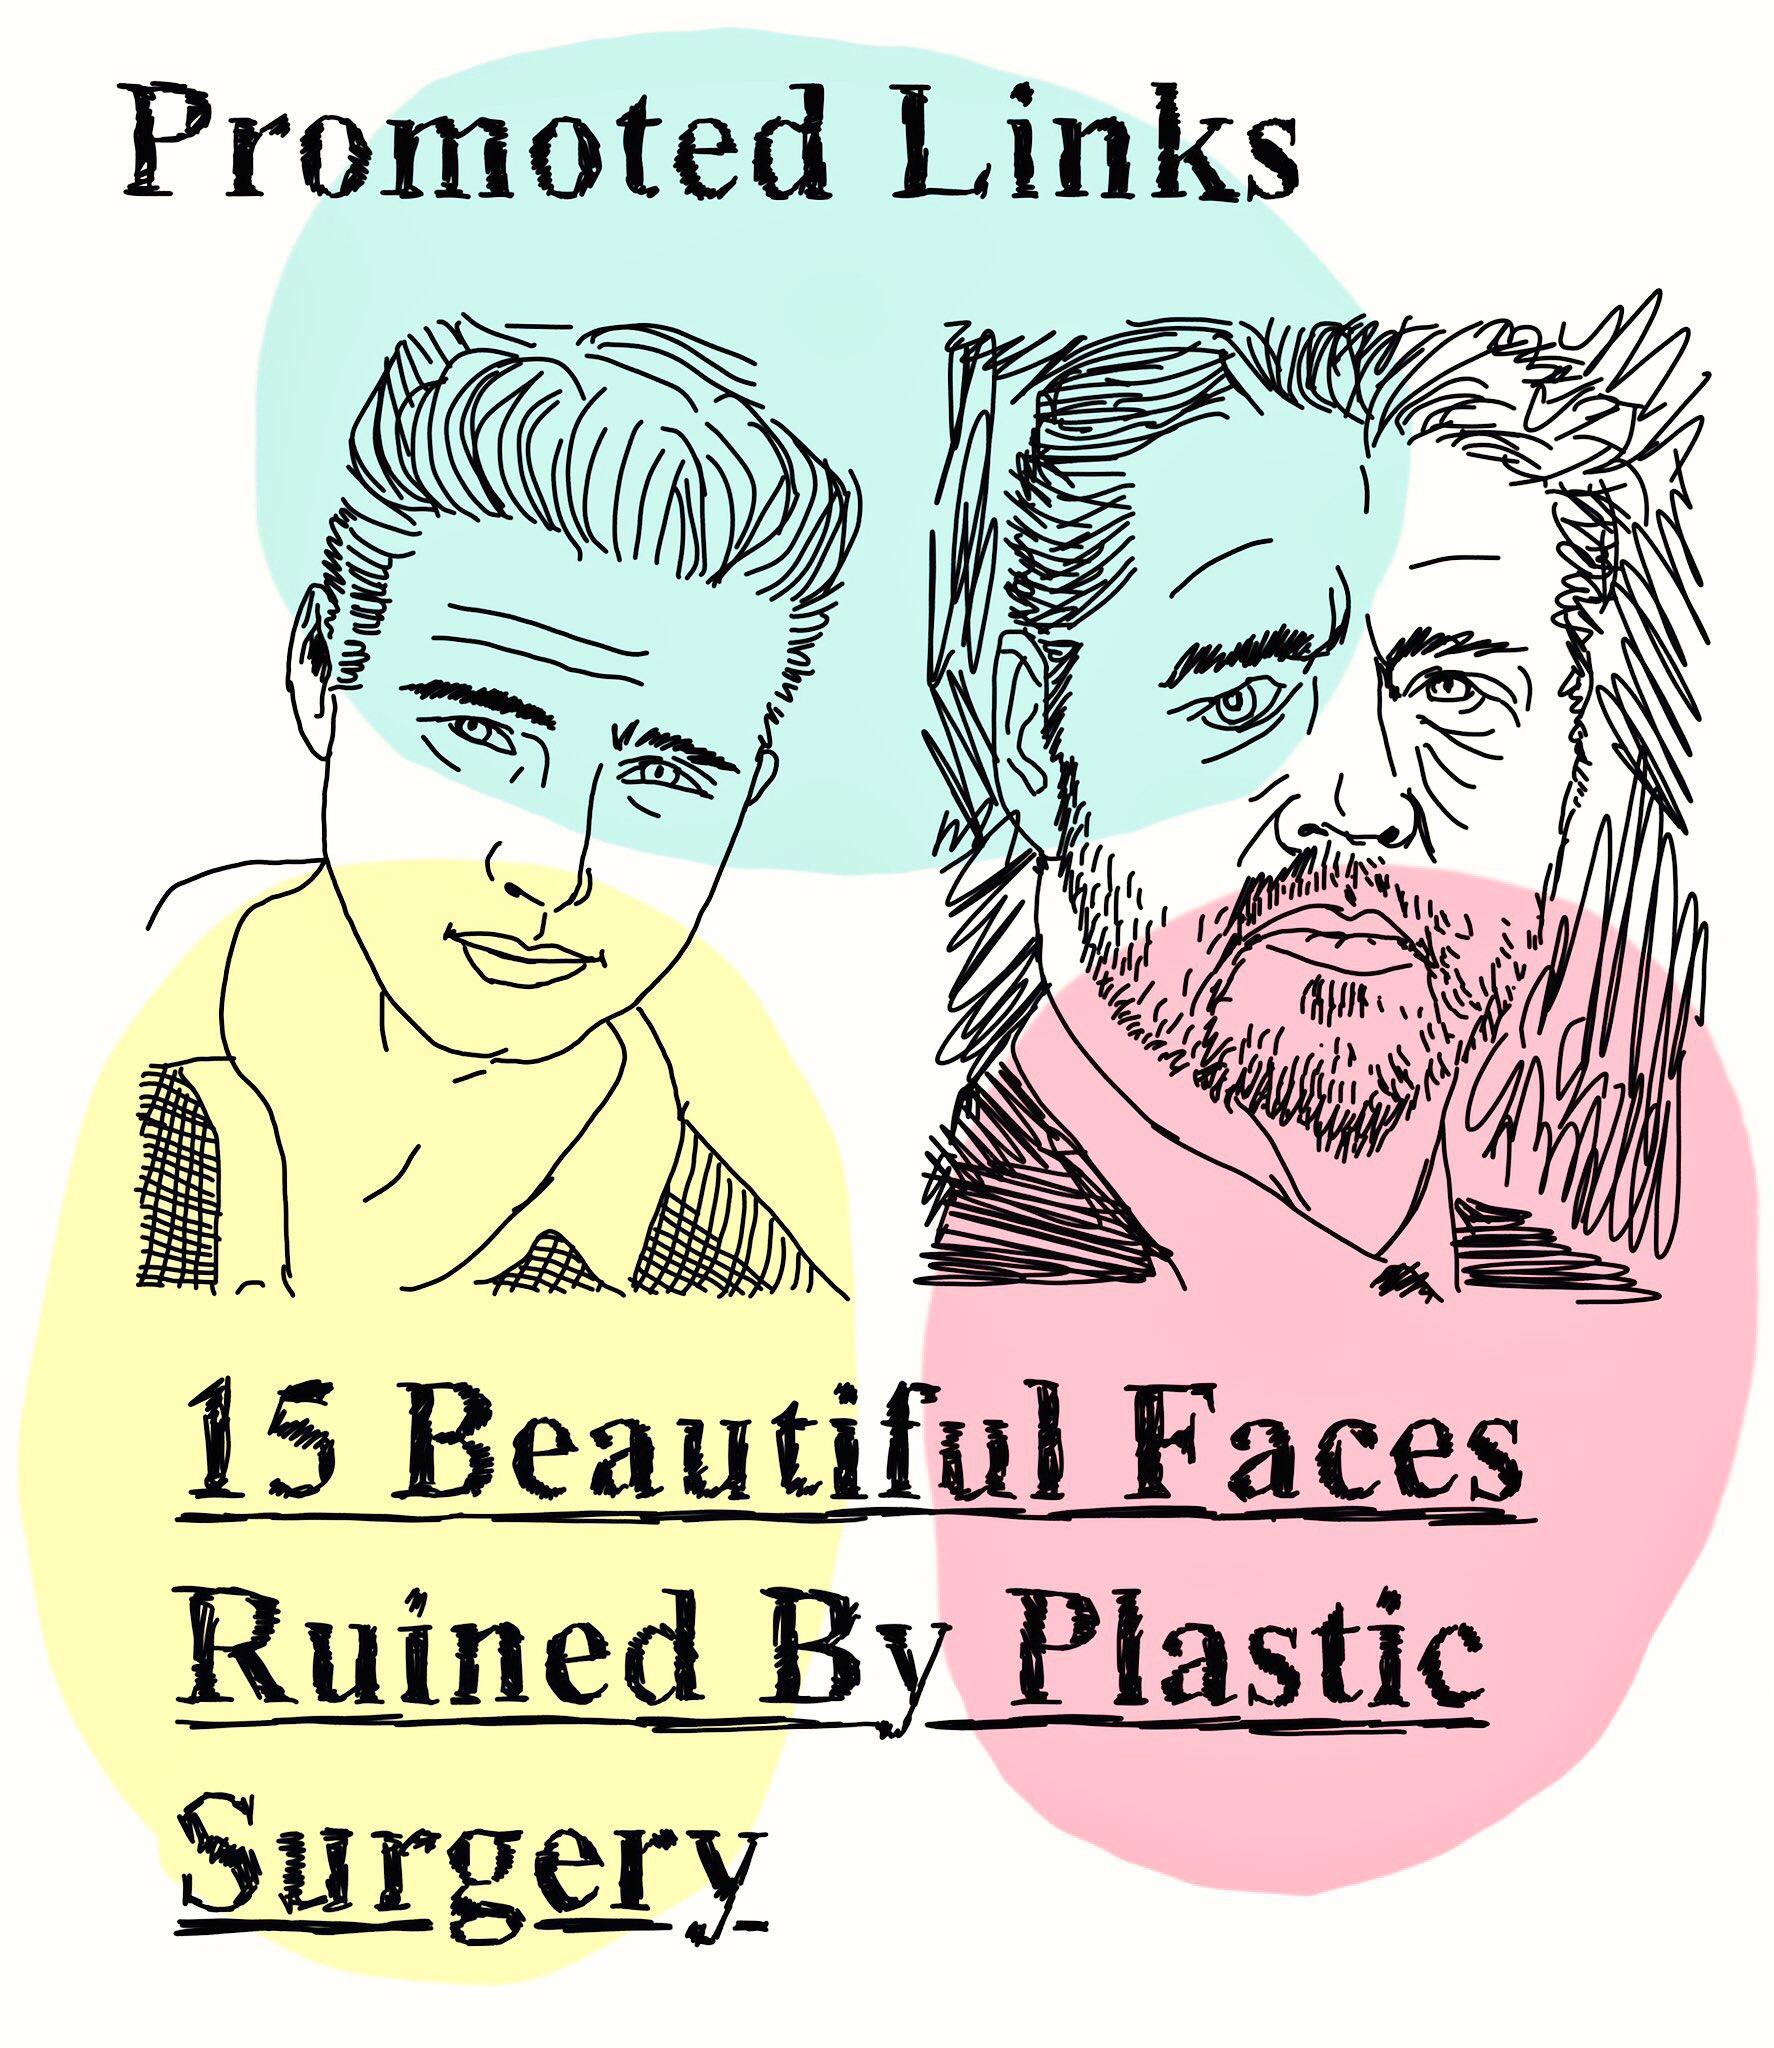 """15 Beautiful Faces"", iPhone 6S, digital image, 2017."